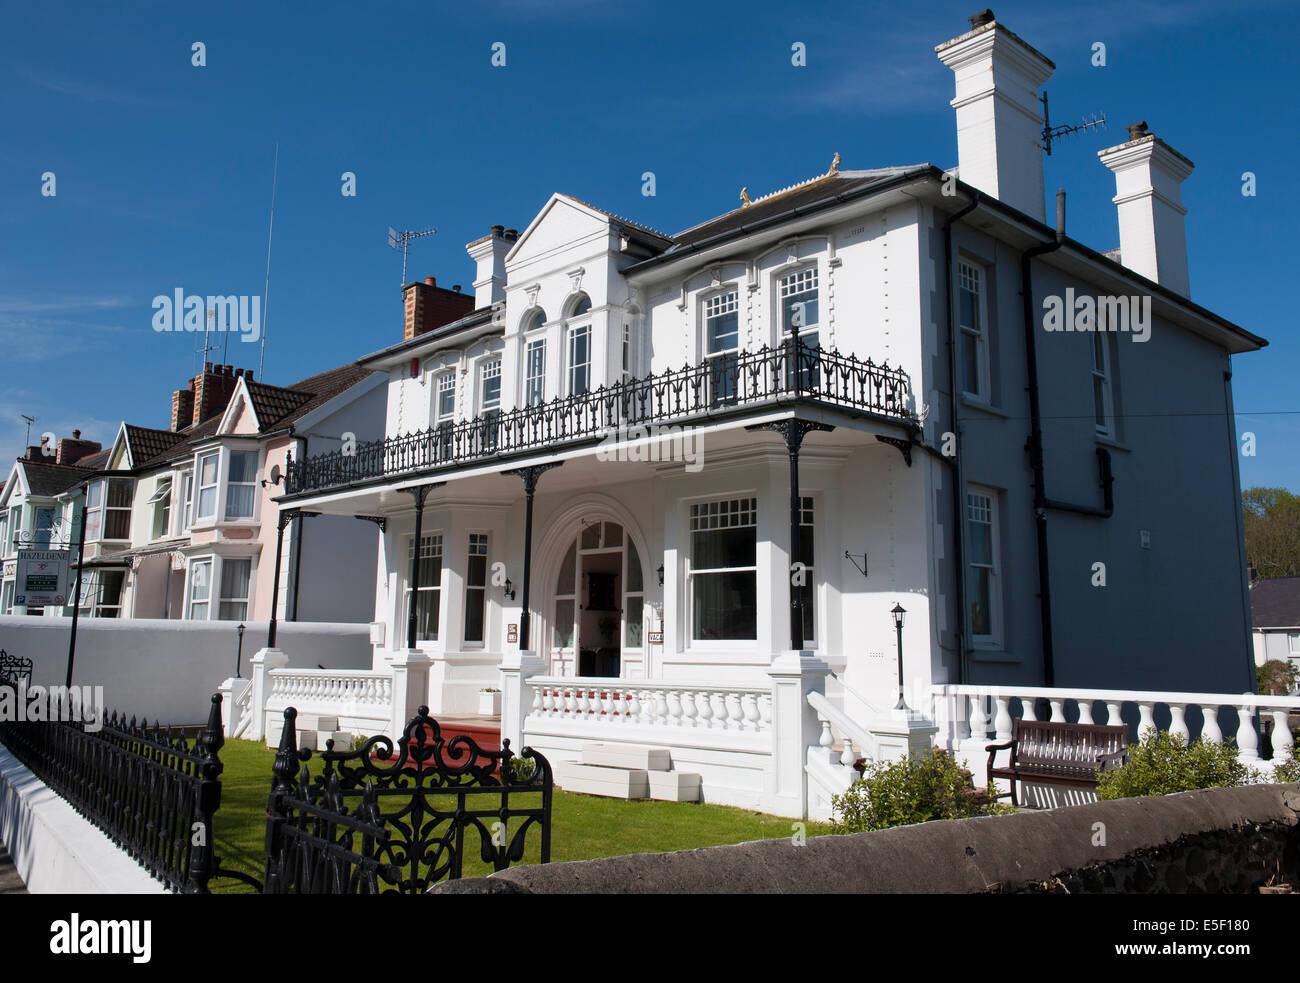 Aberaeron , Cardigan Bay, West Wales, Wales, Uk - Stock Image